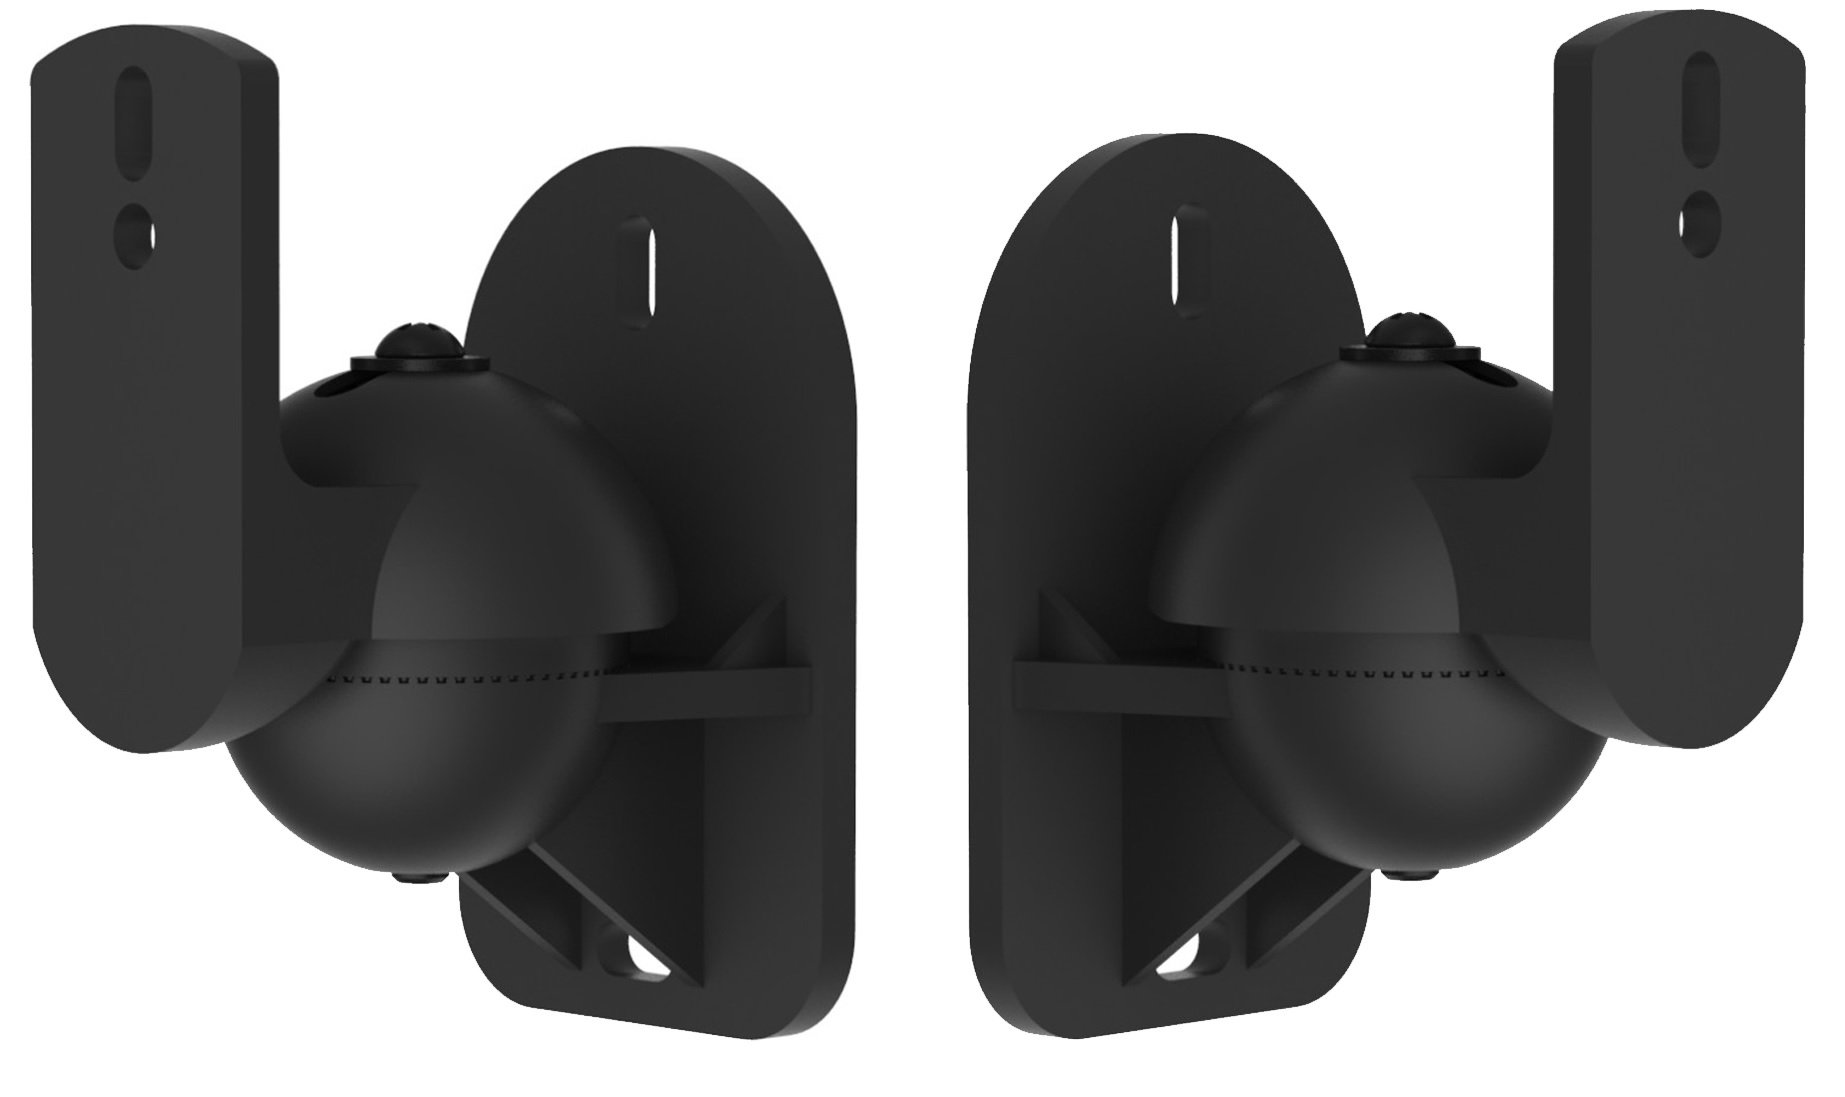 VonHaus Black Universal Wall Mount Speaker Brackets x 2 | 7.7lb Weight Capacity | Swivel & Tilt